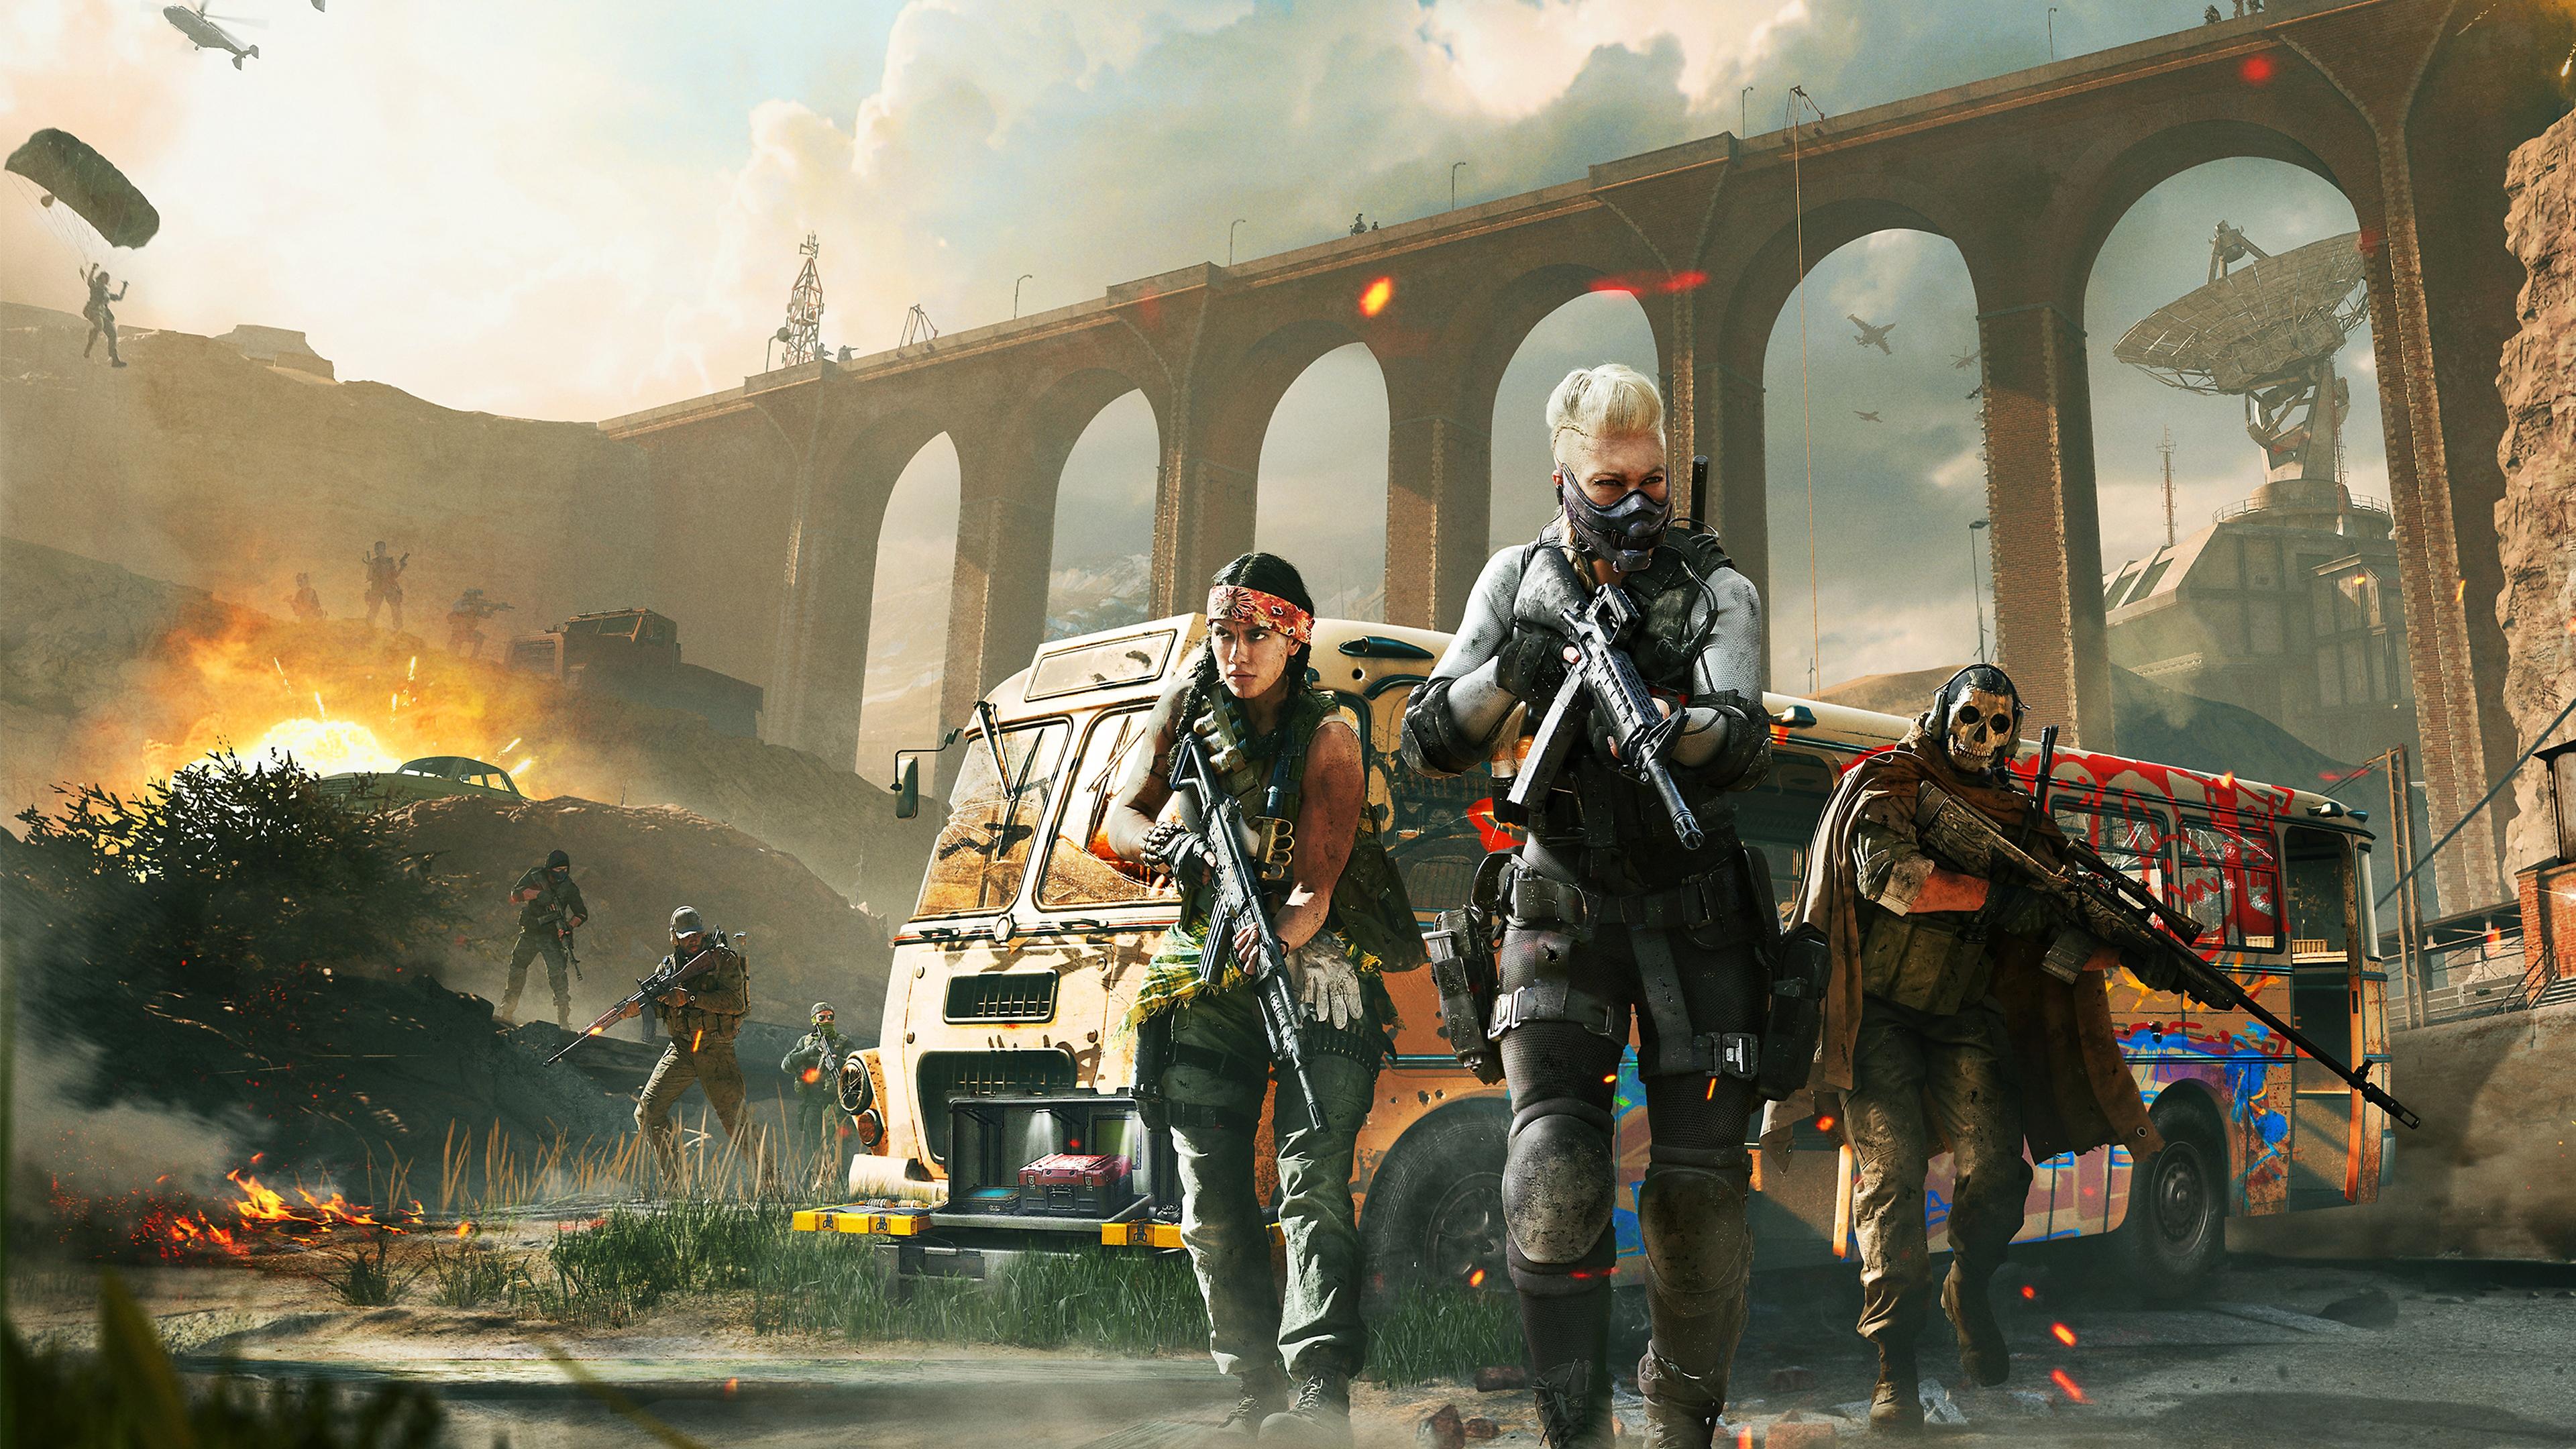 Call of Duty Warzone artwork